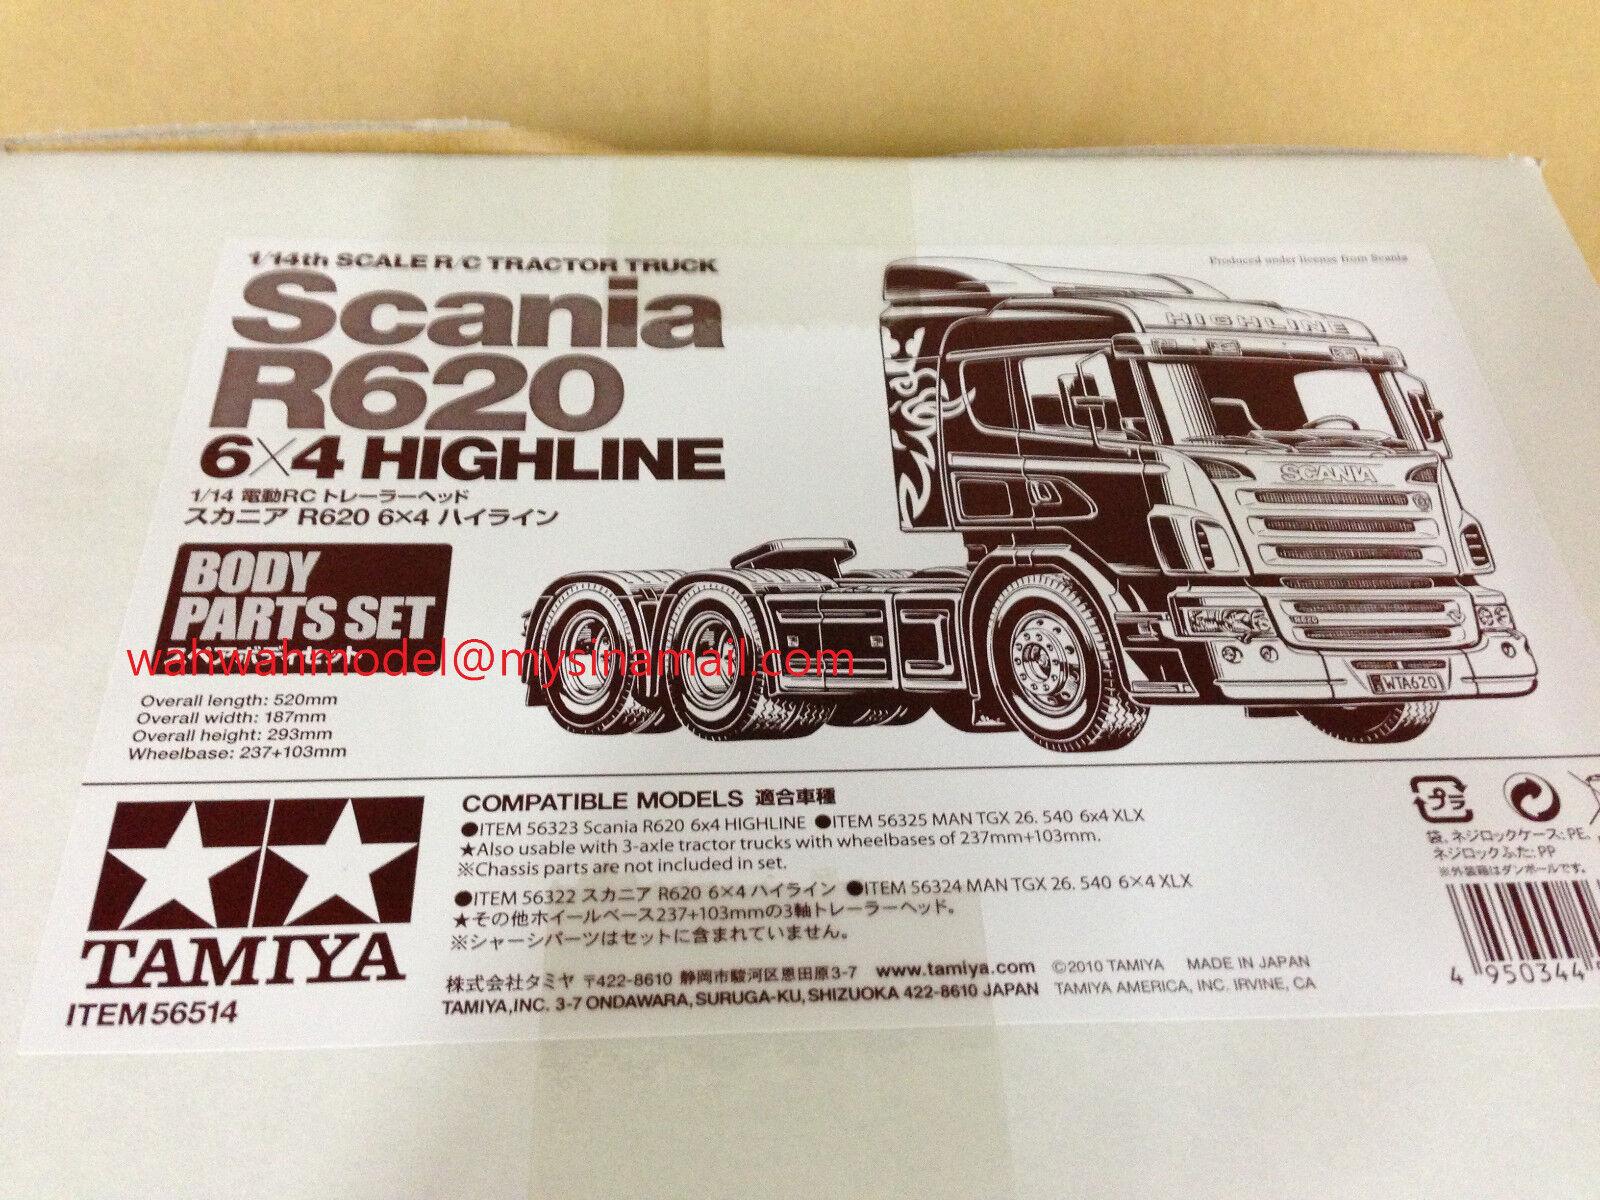 Tamiya 56514 1 14 Radio Control Scania R620 6x4 Highline conjuntos de cuerpo